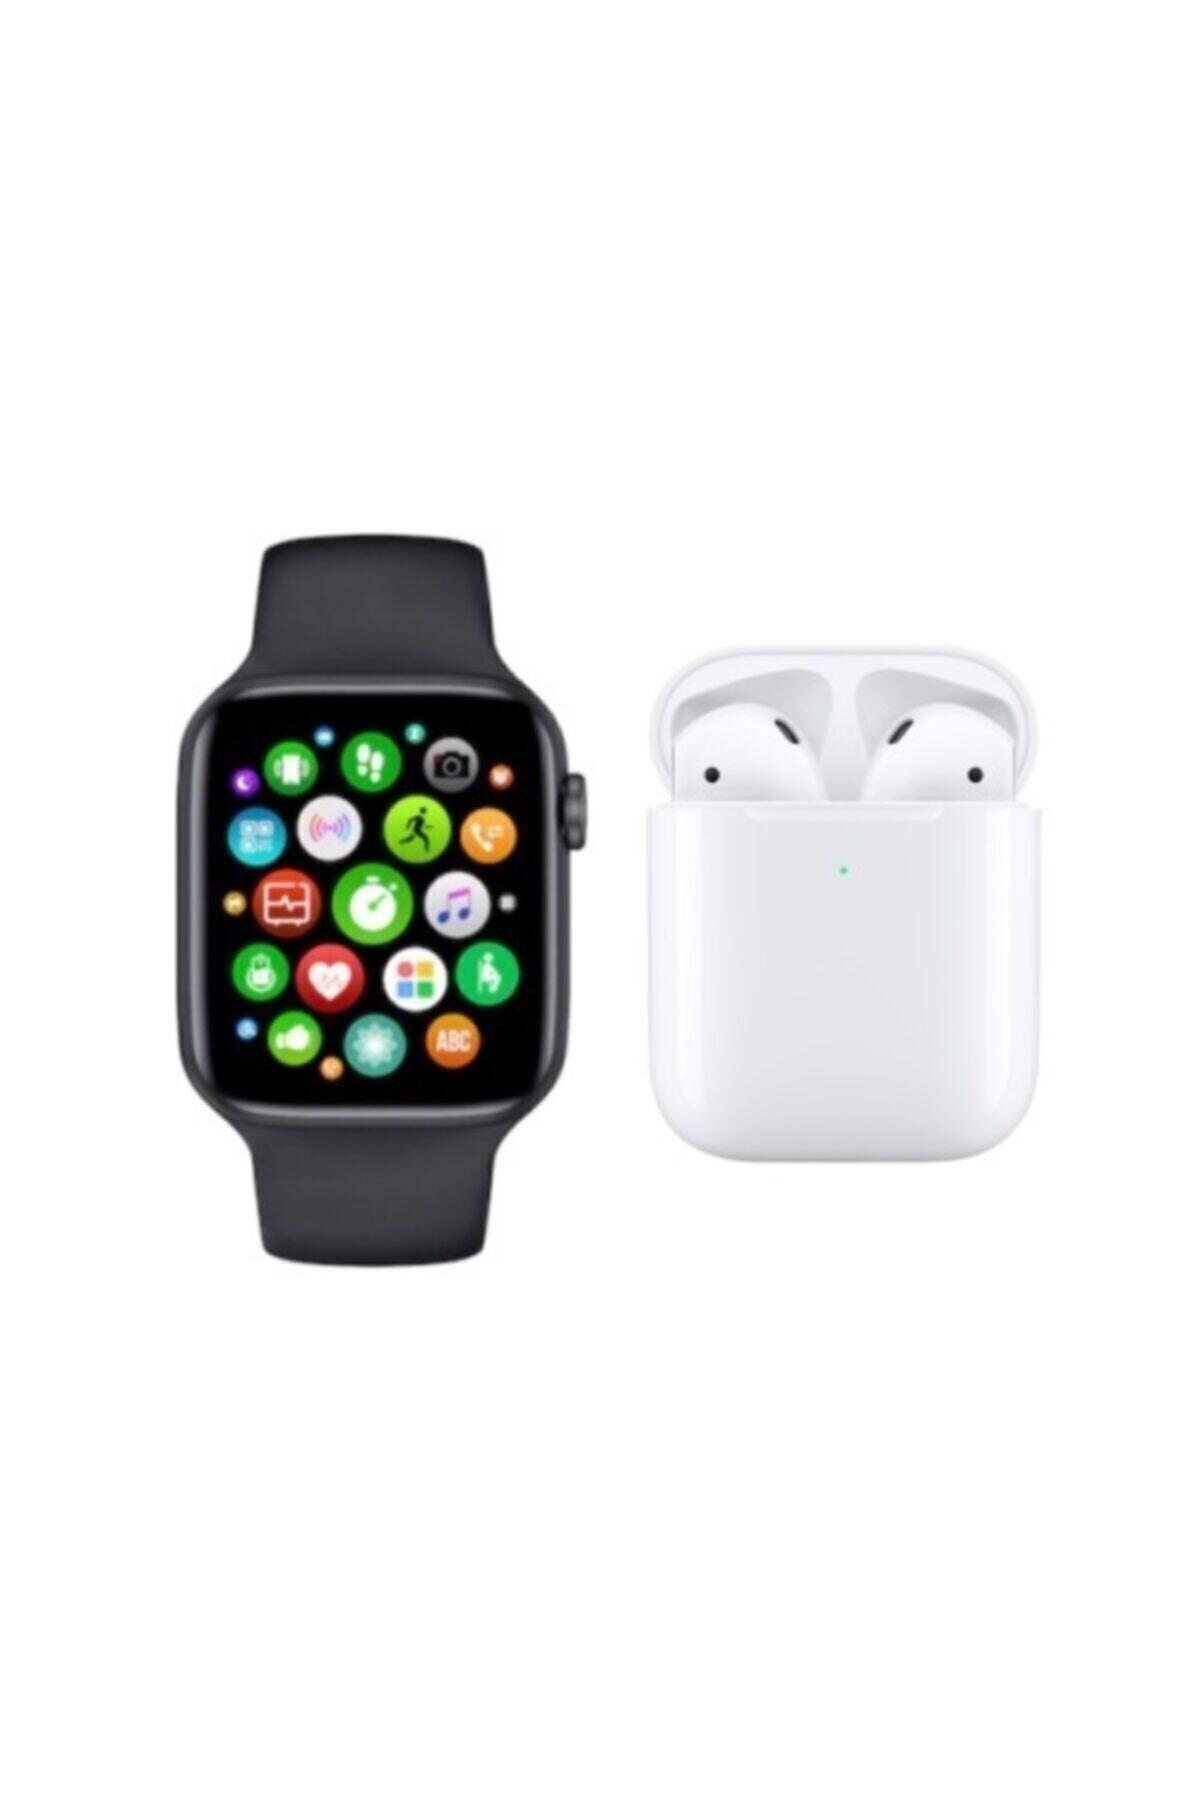 SmartWatch W26 Smart Watch 6 Akıllı Saat + Airpods I12 Kablosuz Kulaklık 1